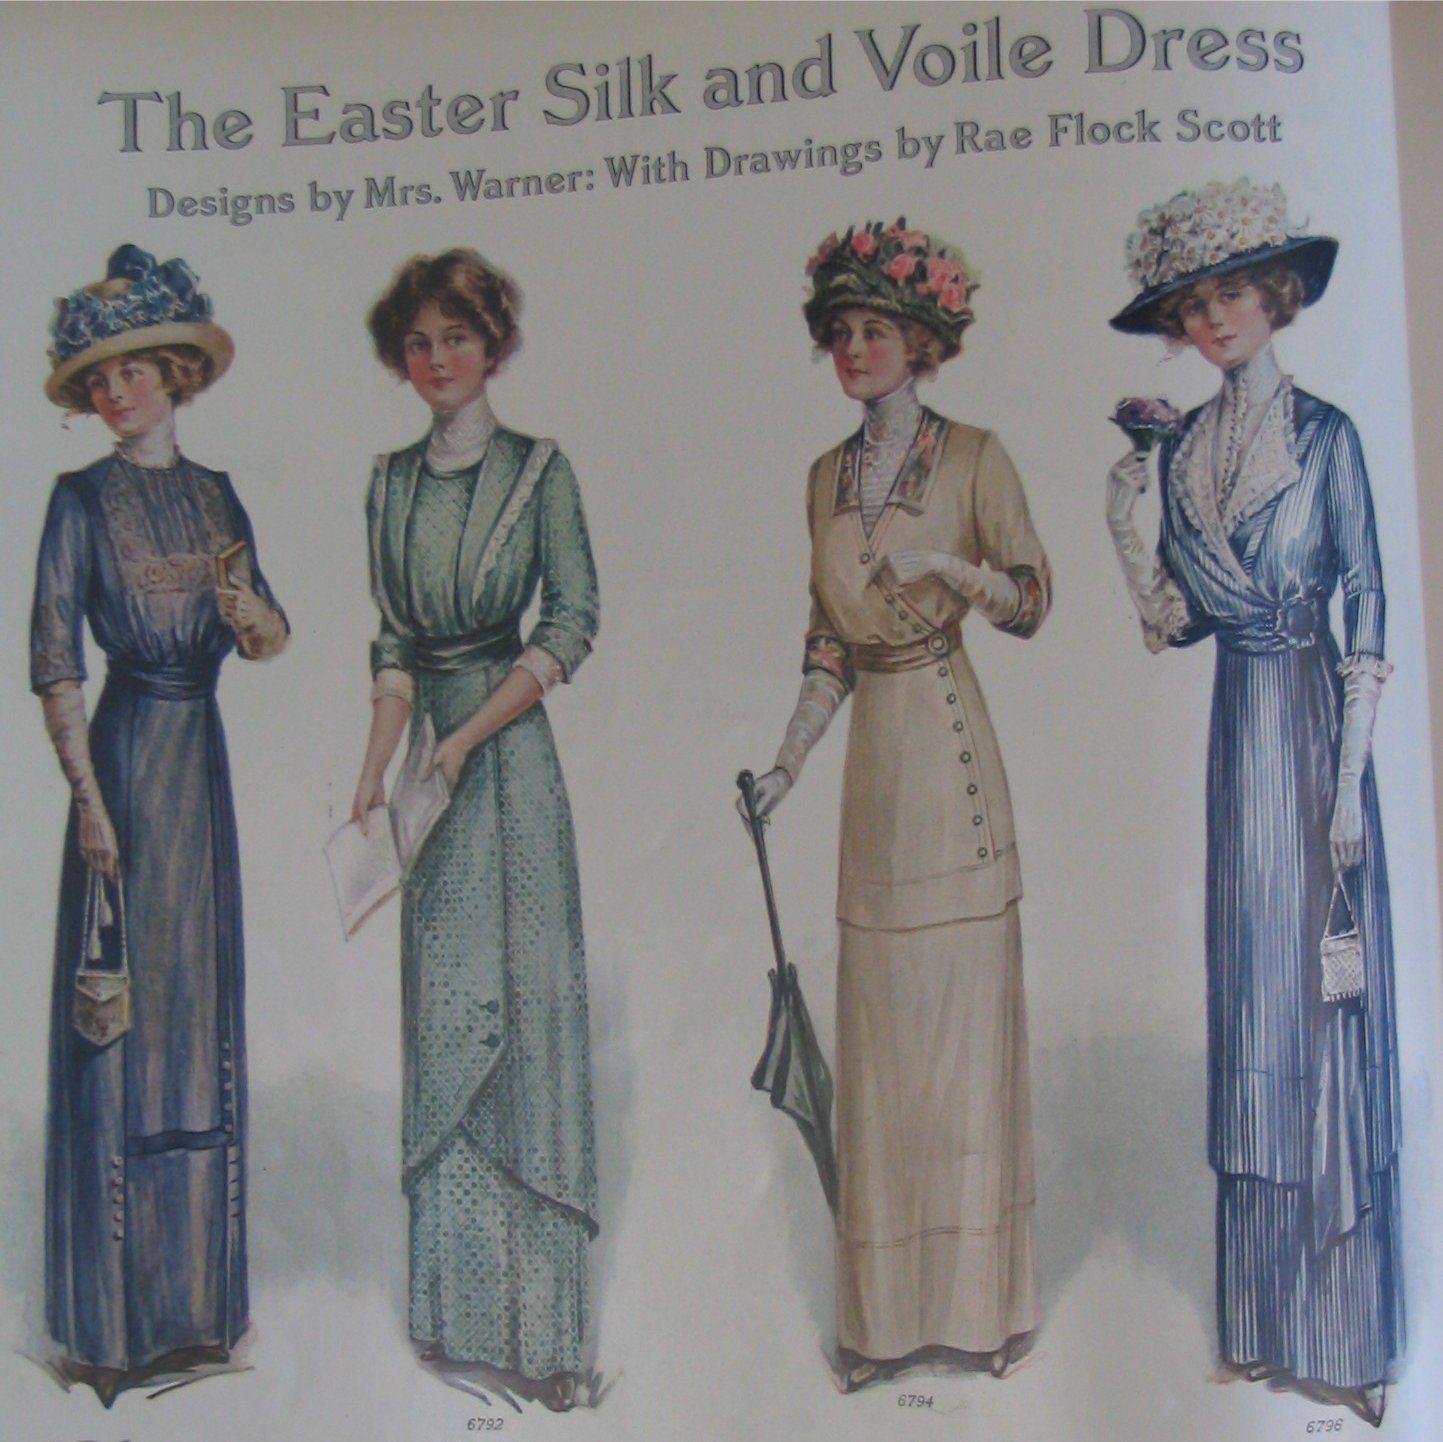 Vintage Victorian: Titanic Ladies' fashions 30